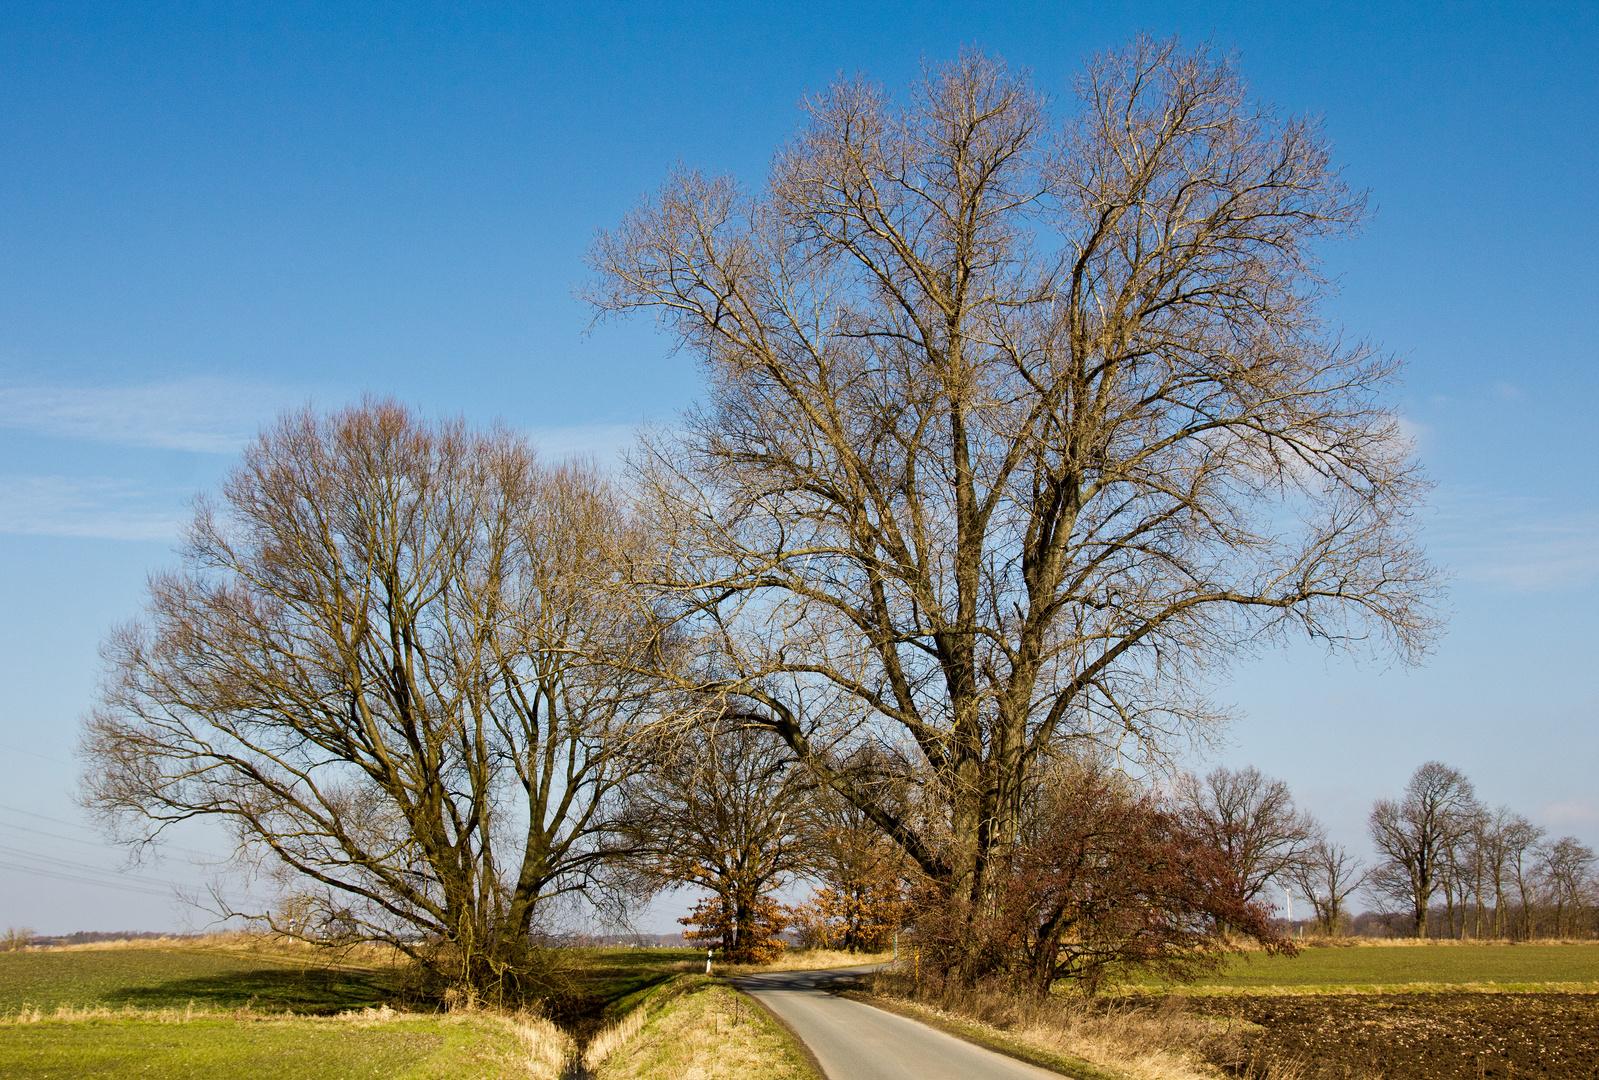 Baumgruppe ohne Laub